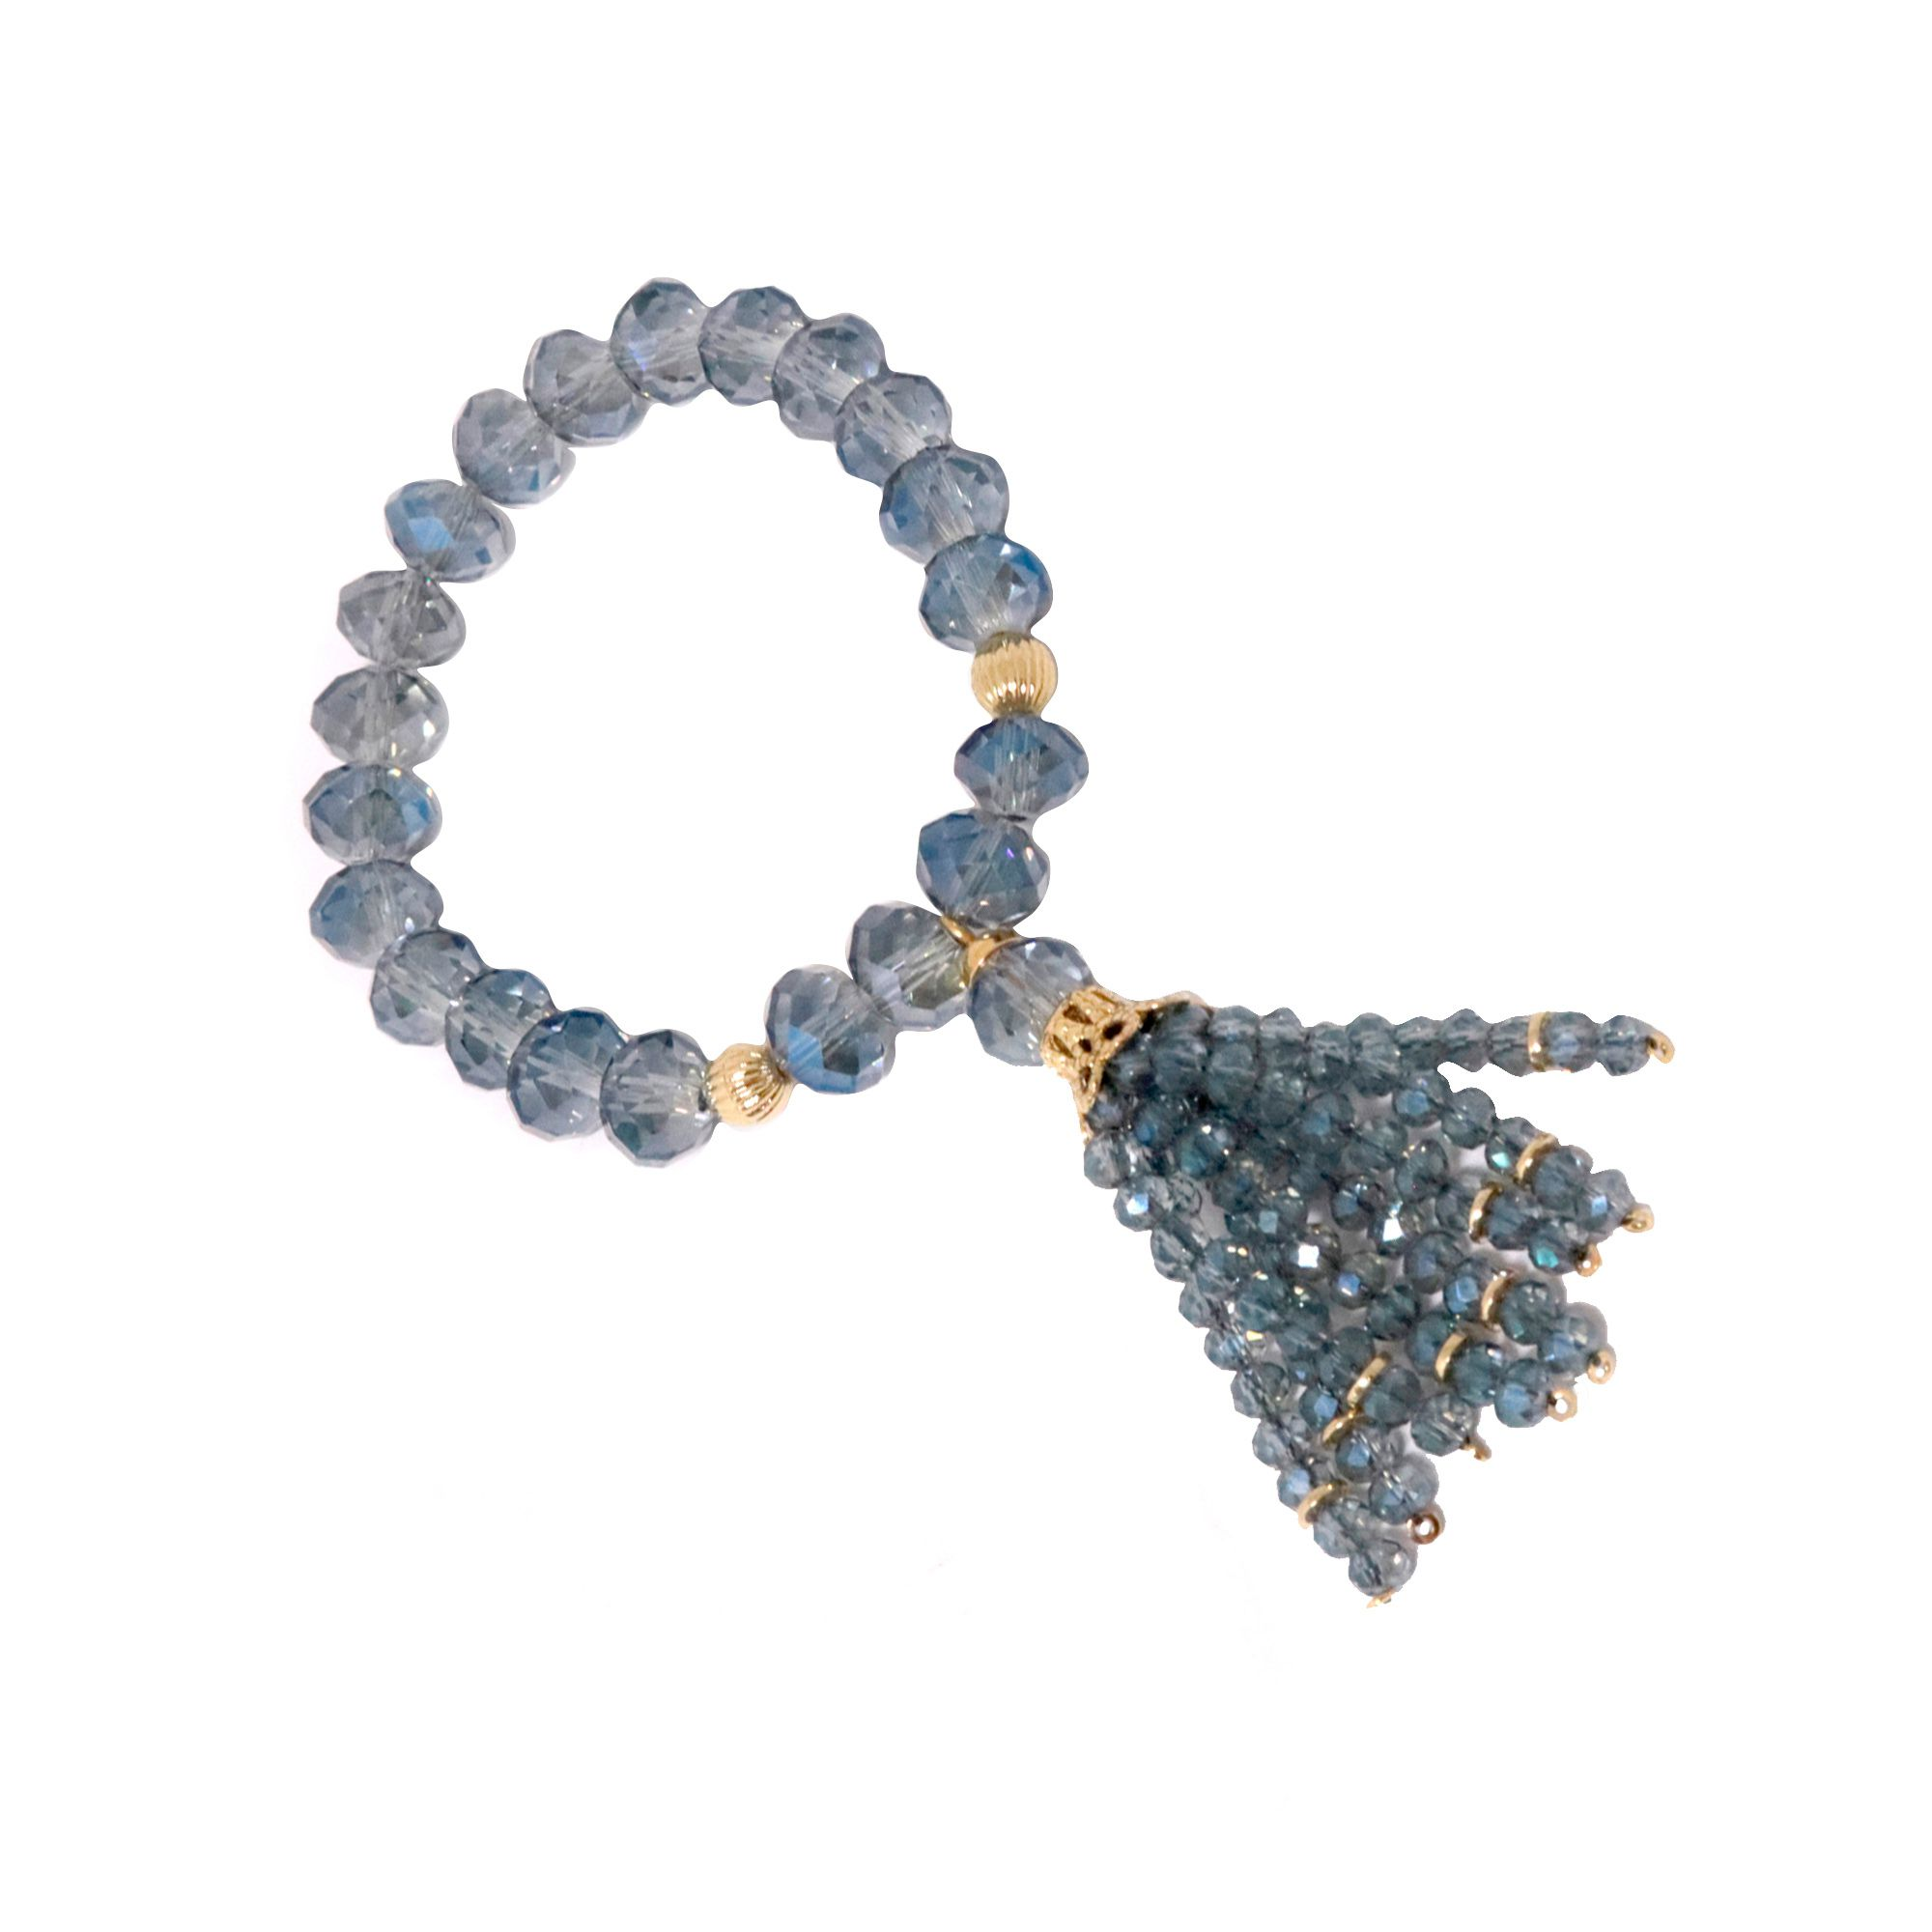 Pulseira Semi joia  Cristal com Cacho banhada a ouro 18k ou rhodium